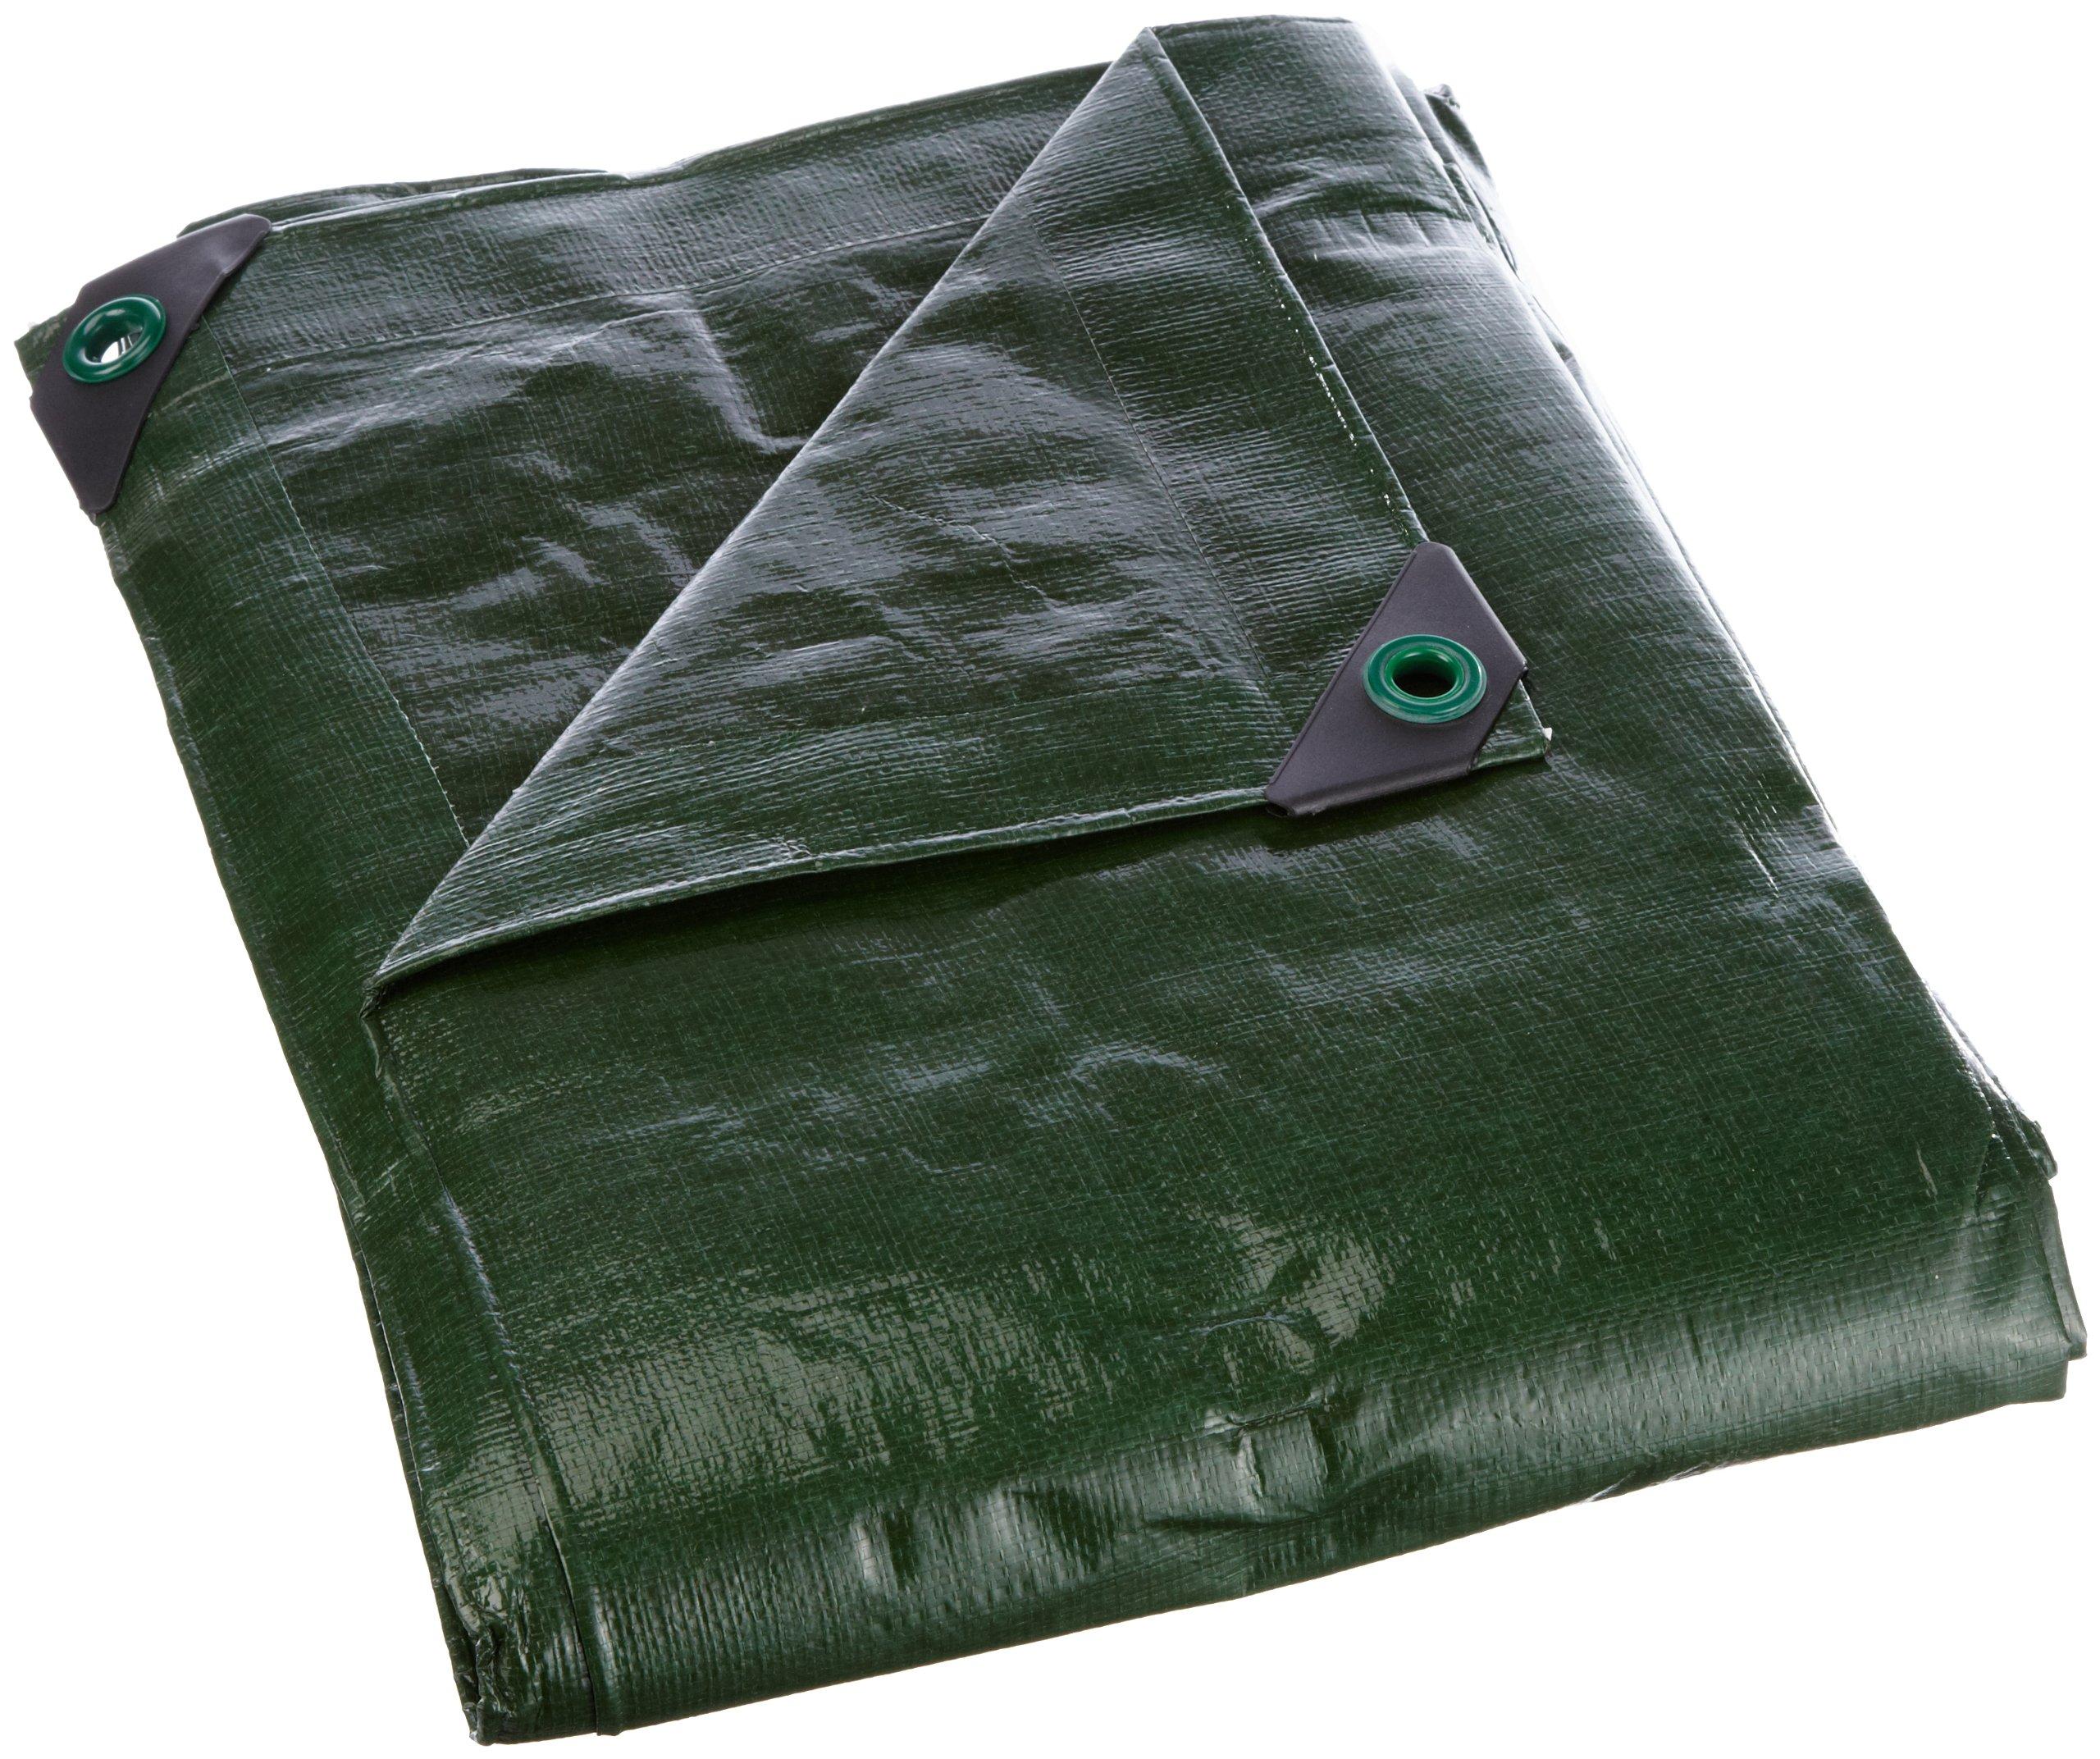 Noor Super Tarpaulin, 200 G/M², 3.00 X 4.00 M, Color: Green, Pp/Pe 3X4M Gruen